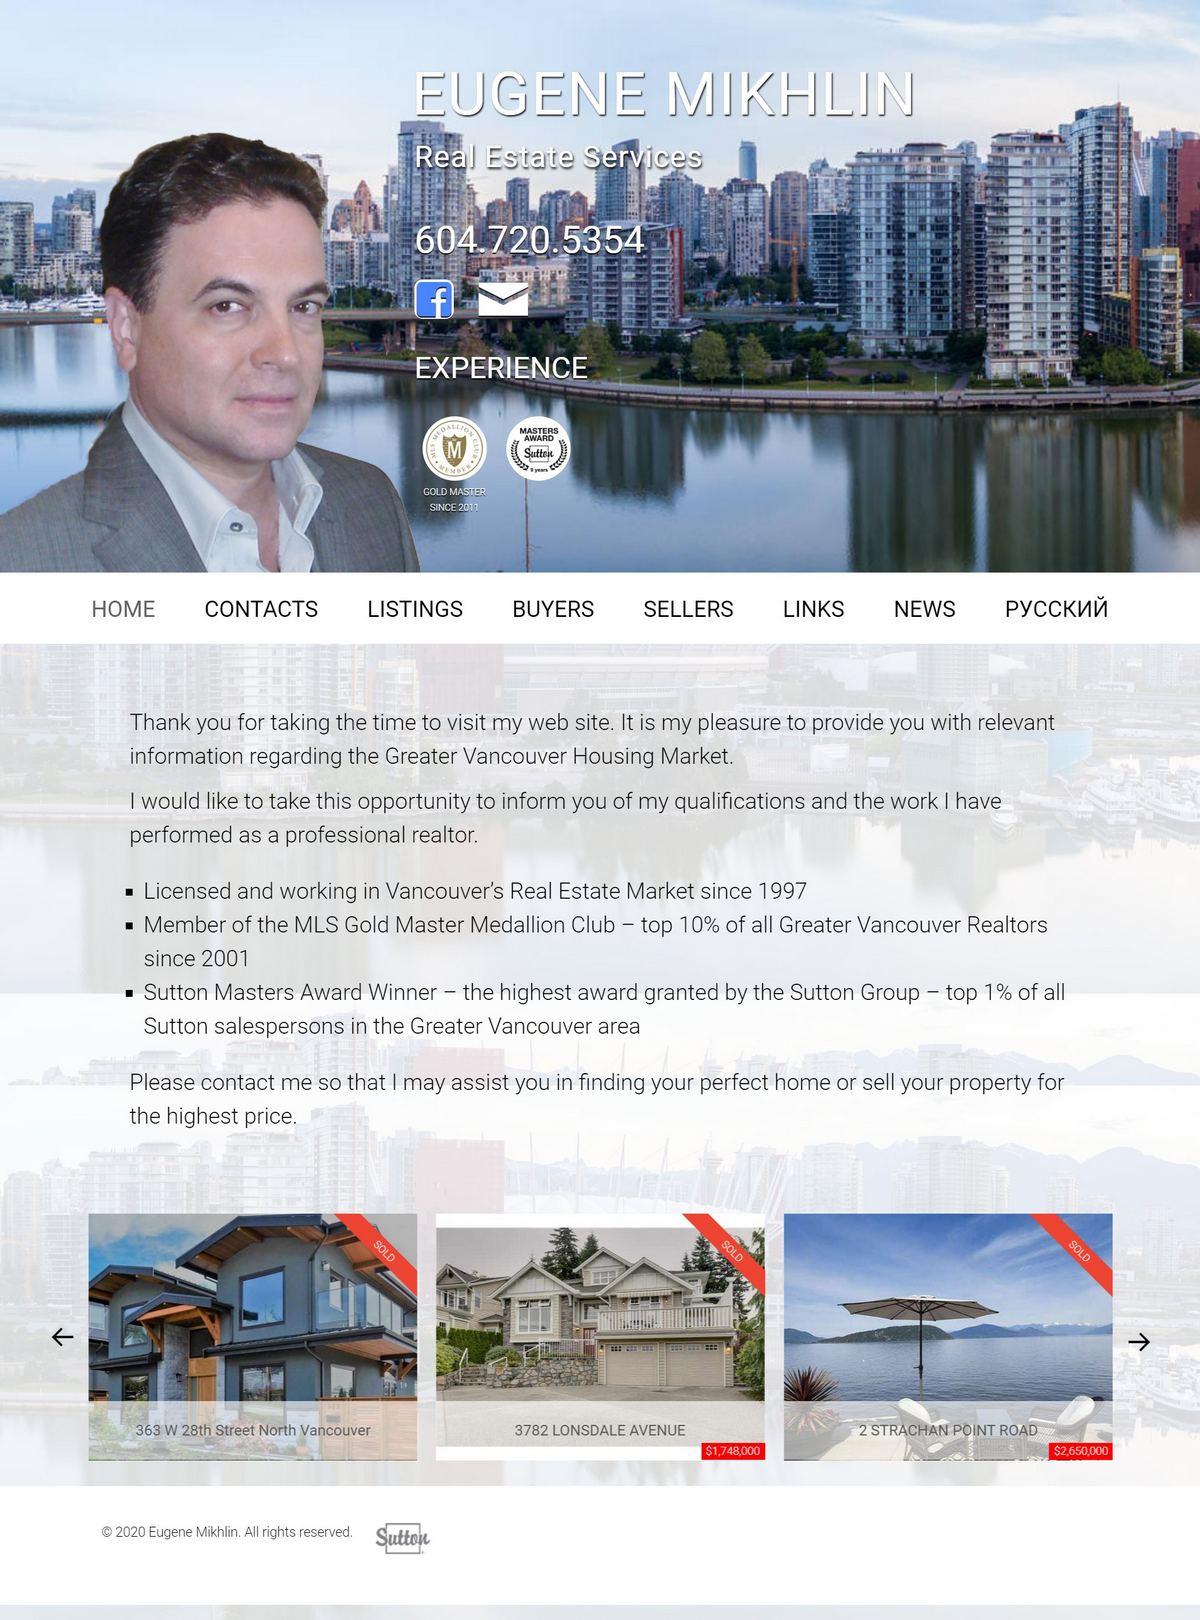 вебсайт Евгения Михлина